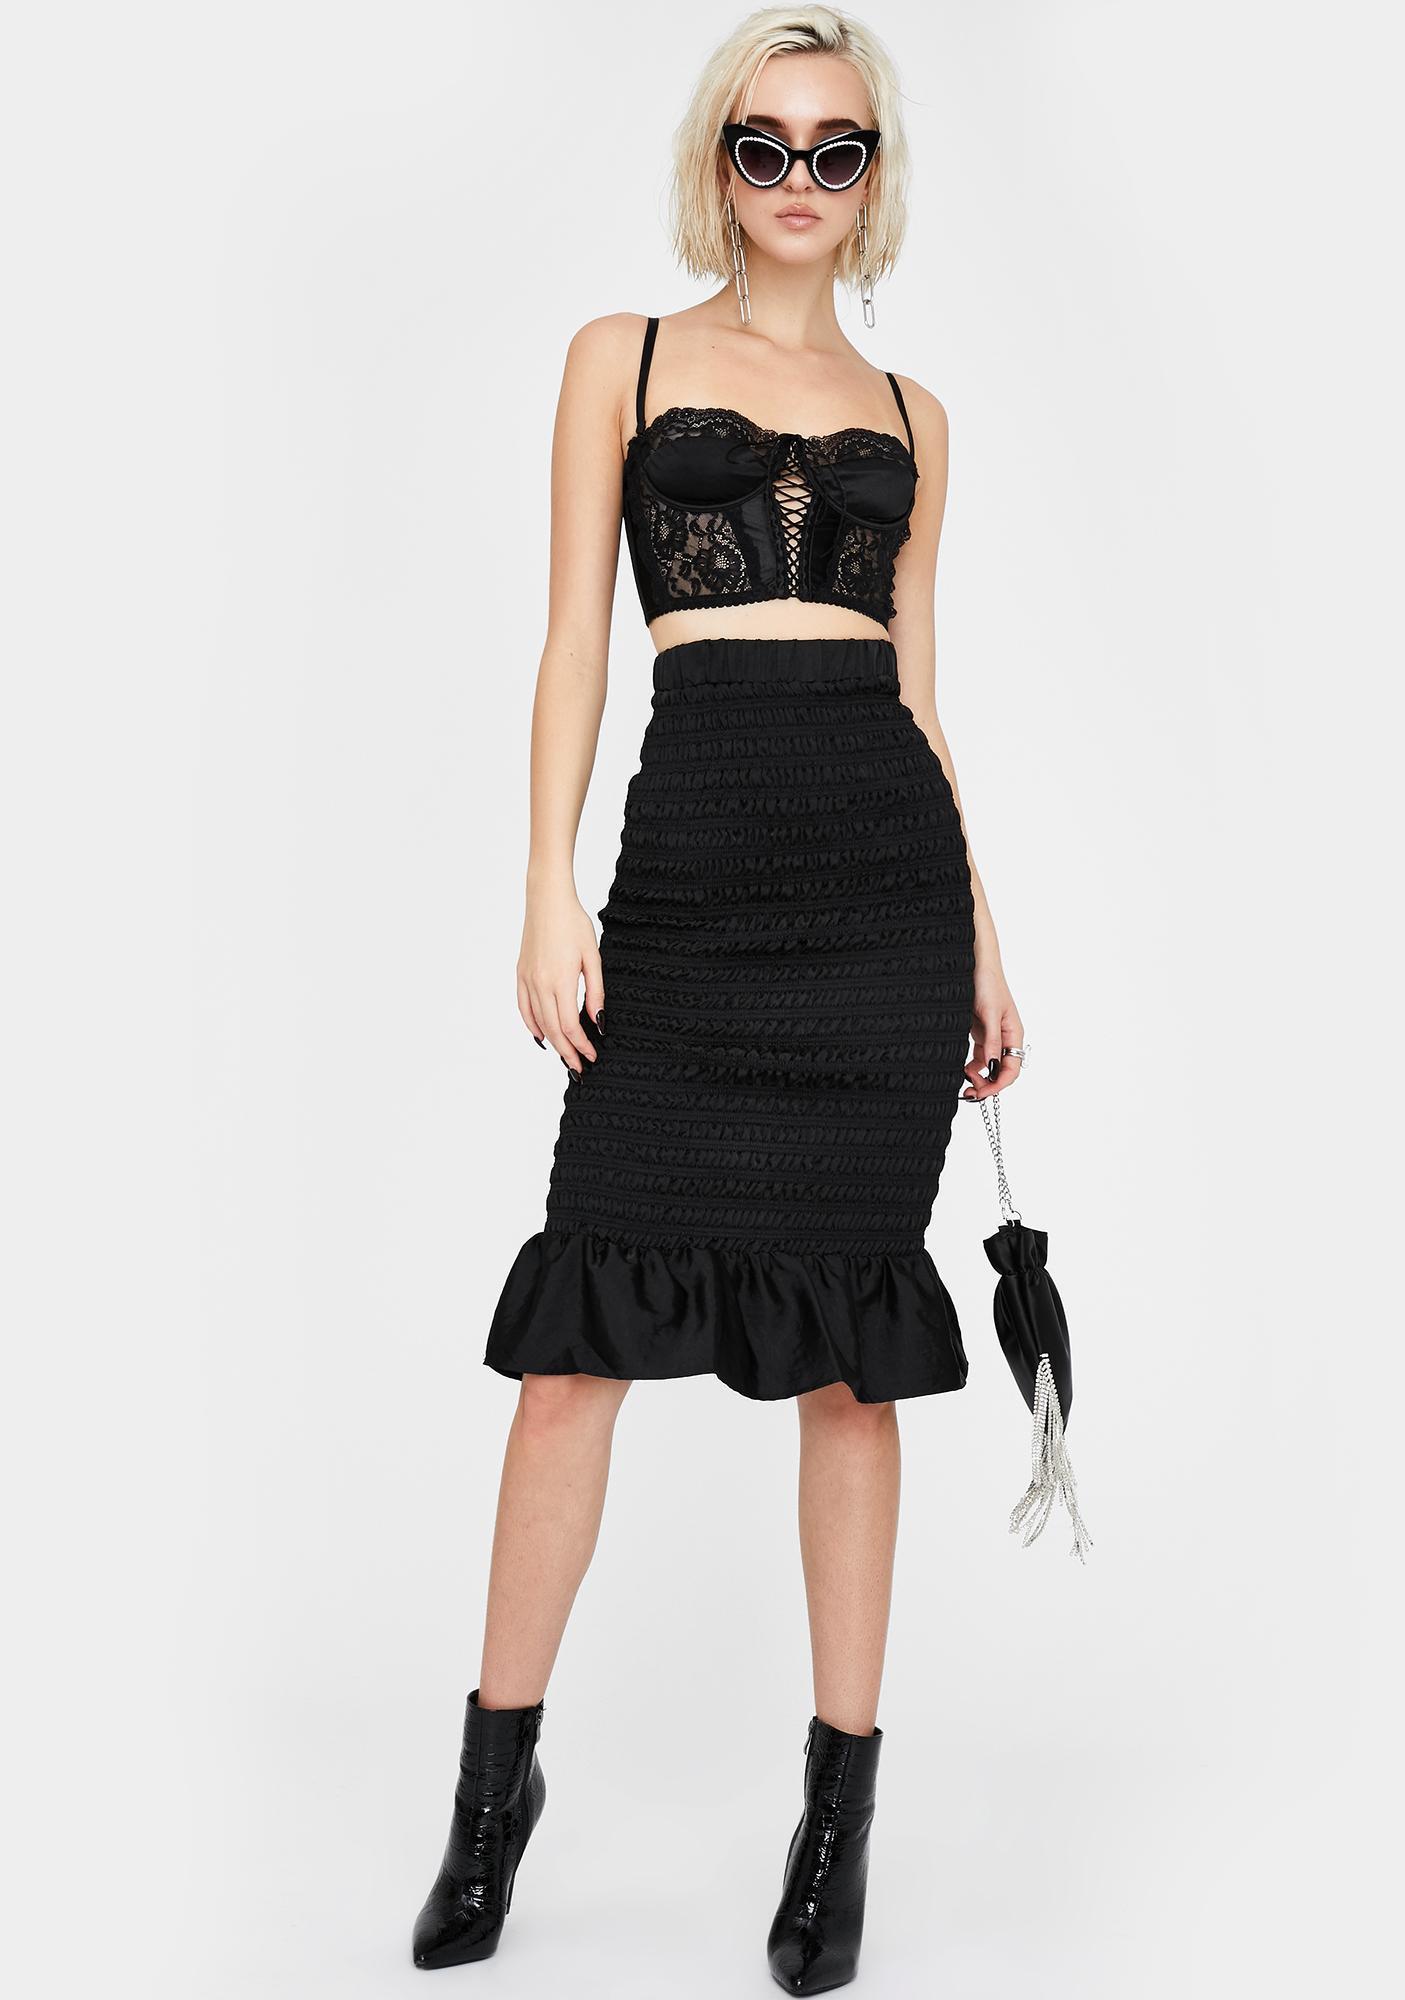 Glamorous Black Satin Peplum Mini Skirt